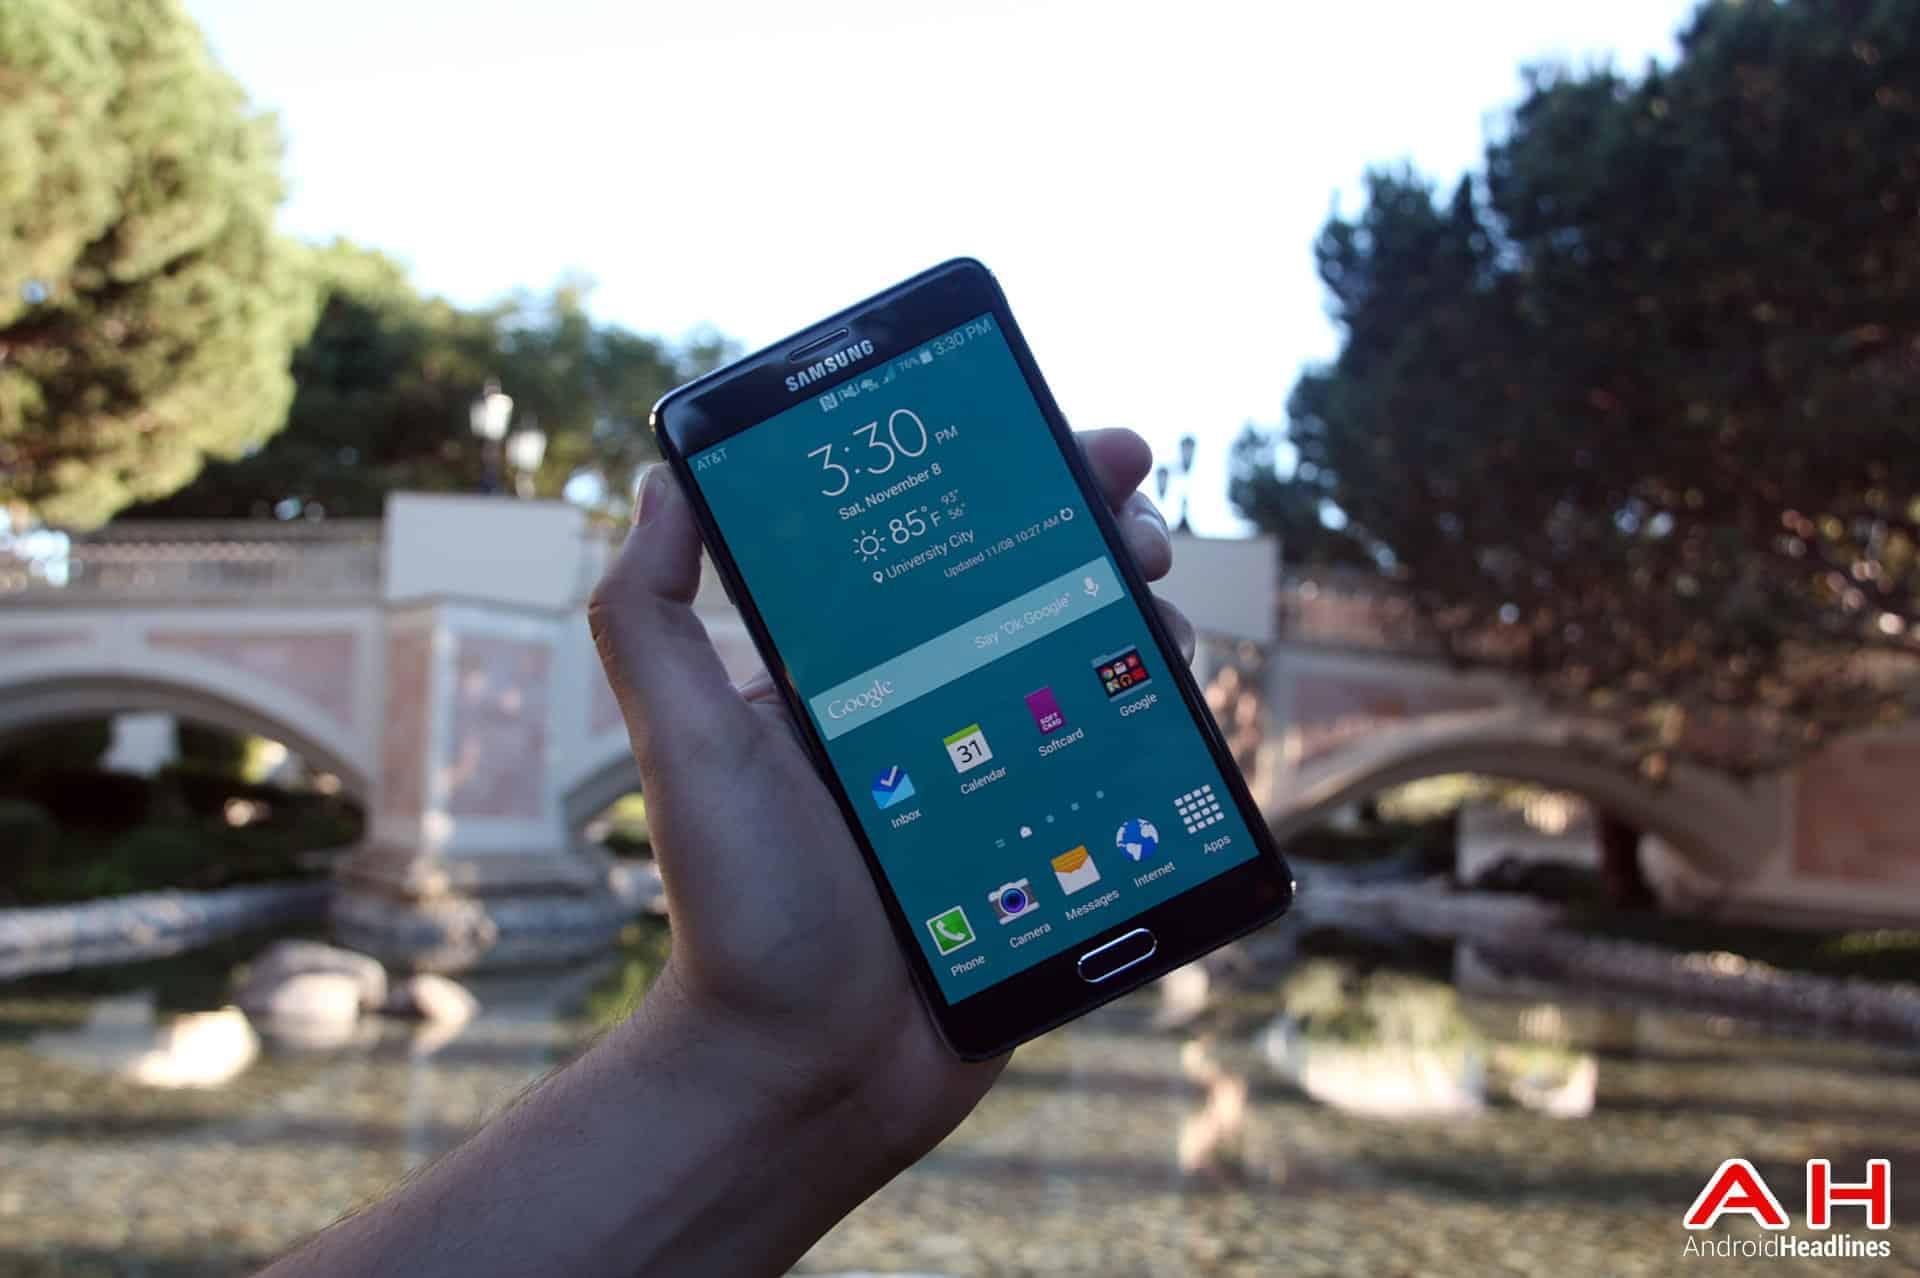 AH Samsung Note 4 - John-4